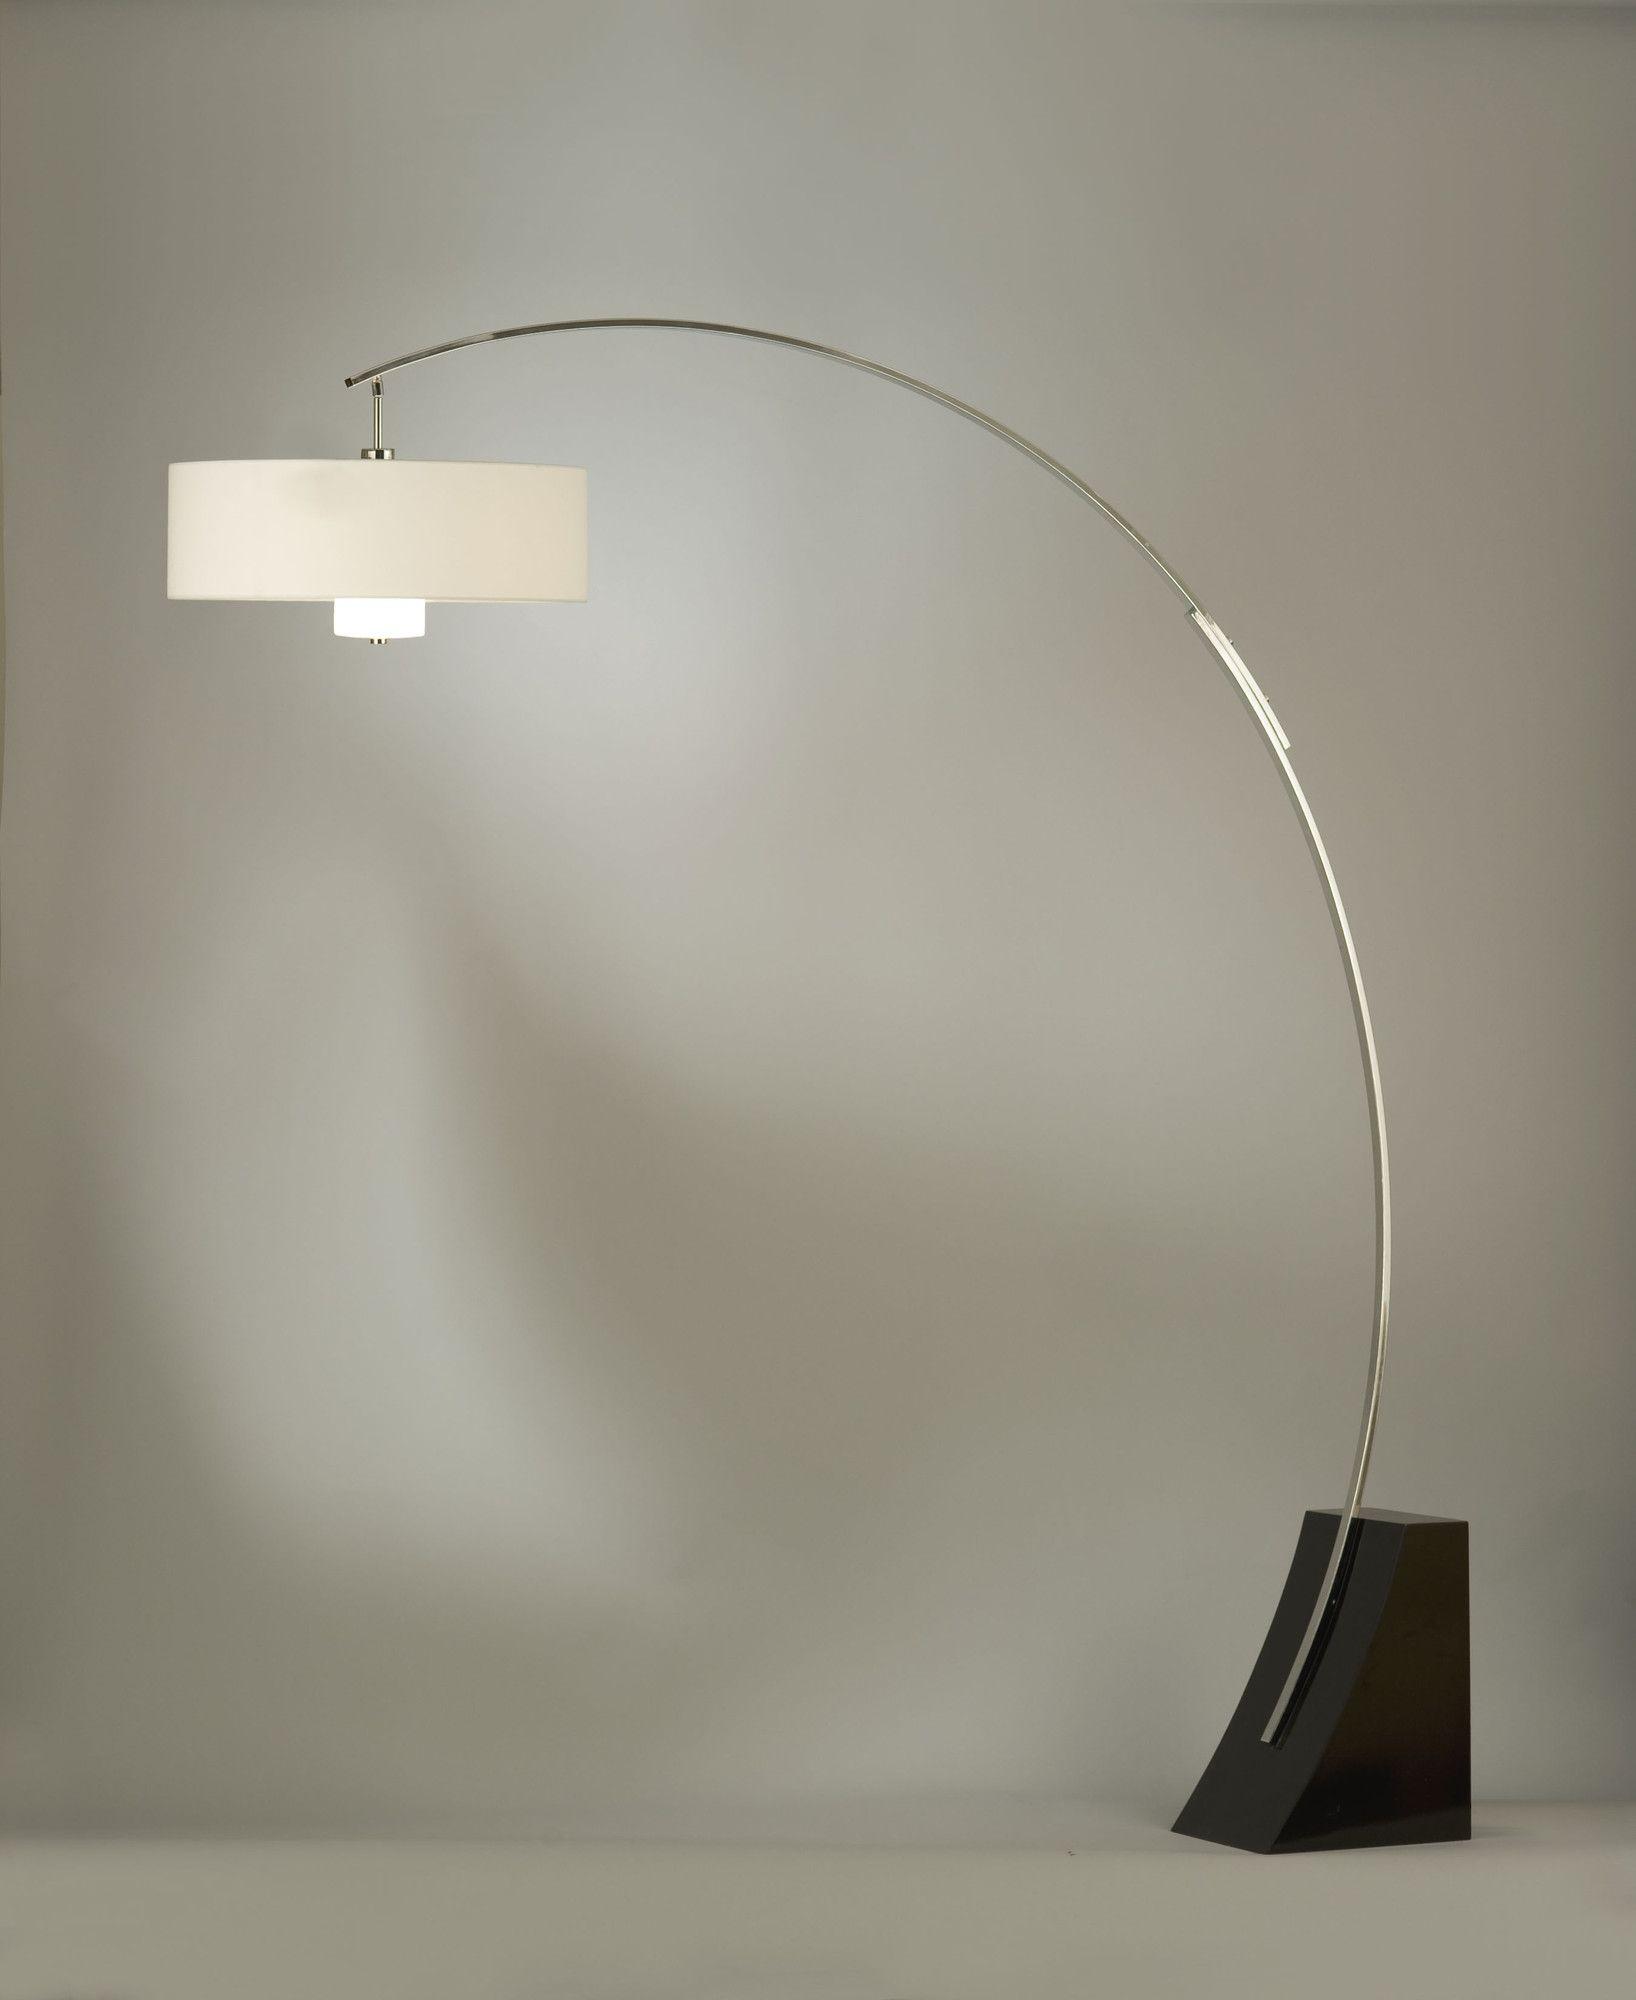 Nova Broadway Arc Floor Lamp Reviews Wayfair Arc Floor Lamps Mid Century Floor Lamps Lantern Floor Lamp